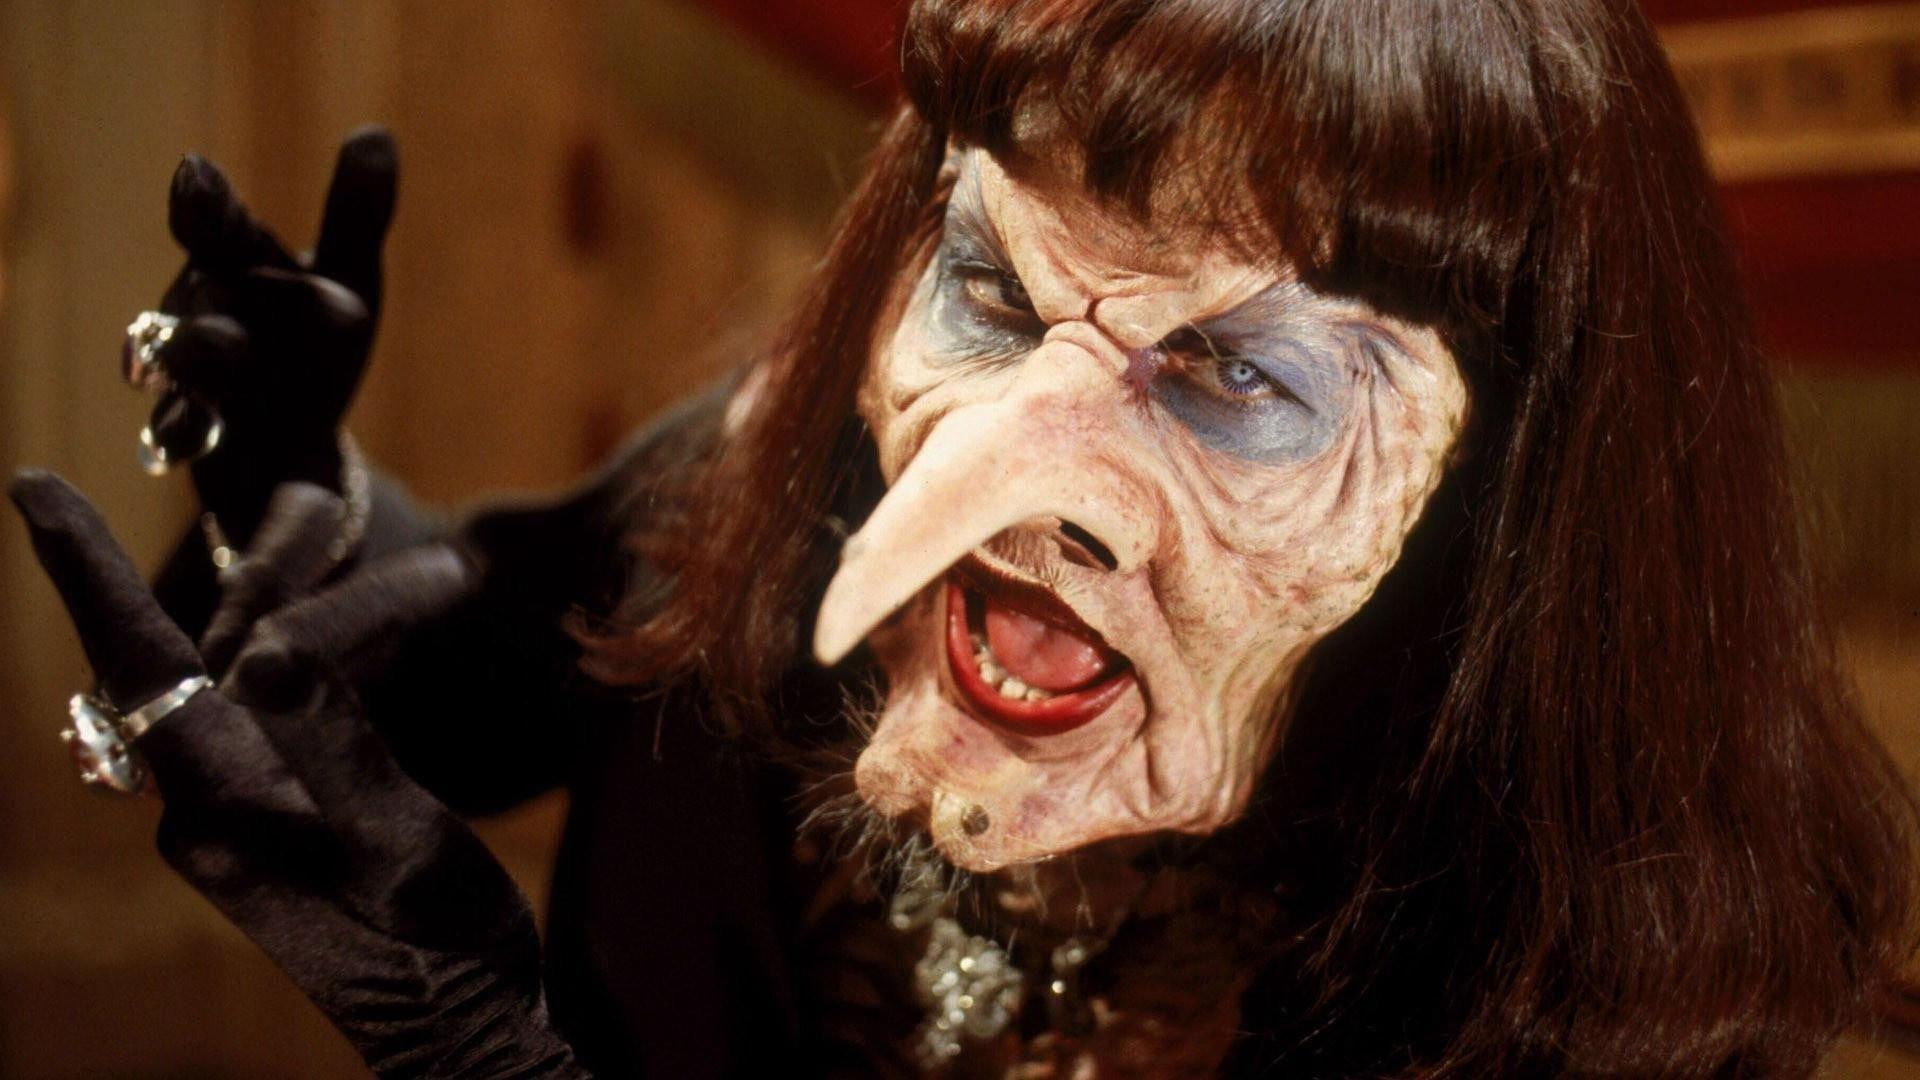 ВЕйском районе парень увидел вбабушке ведьму изабил ееломом